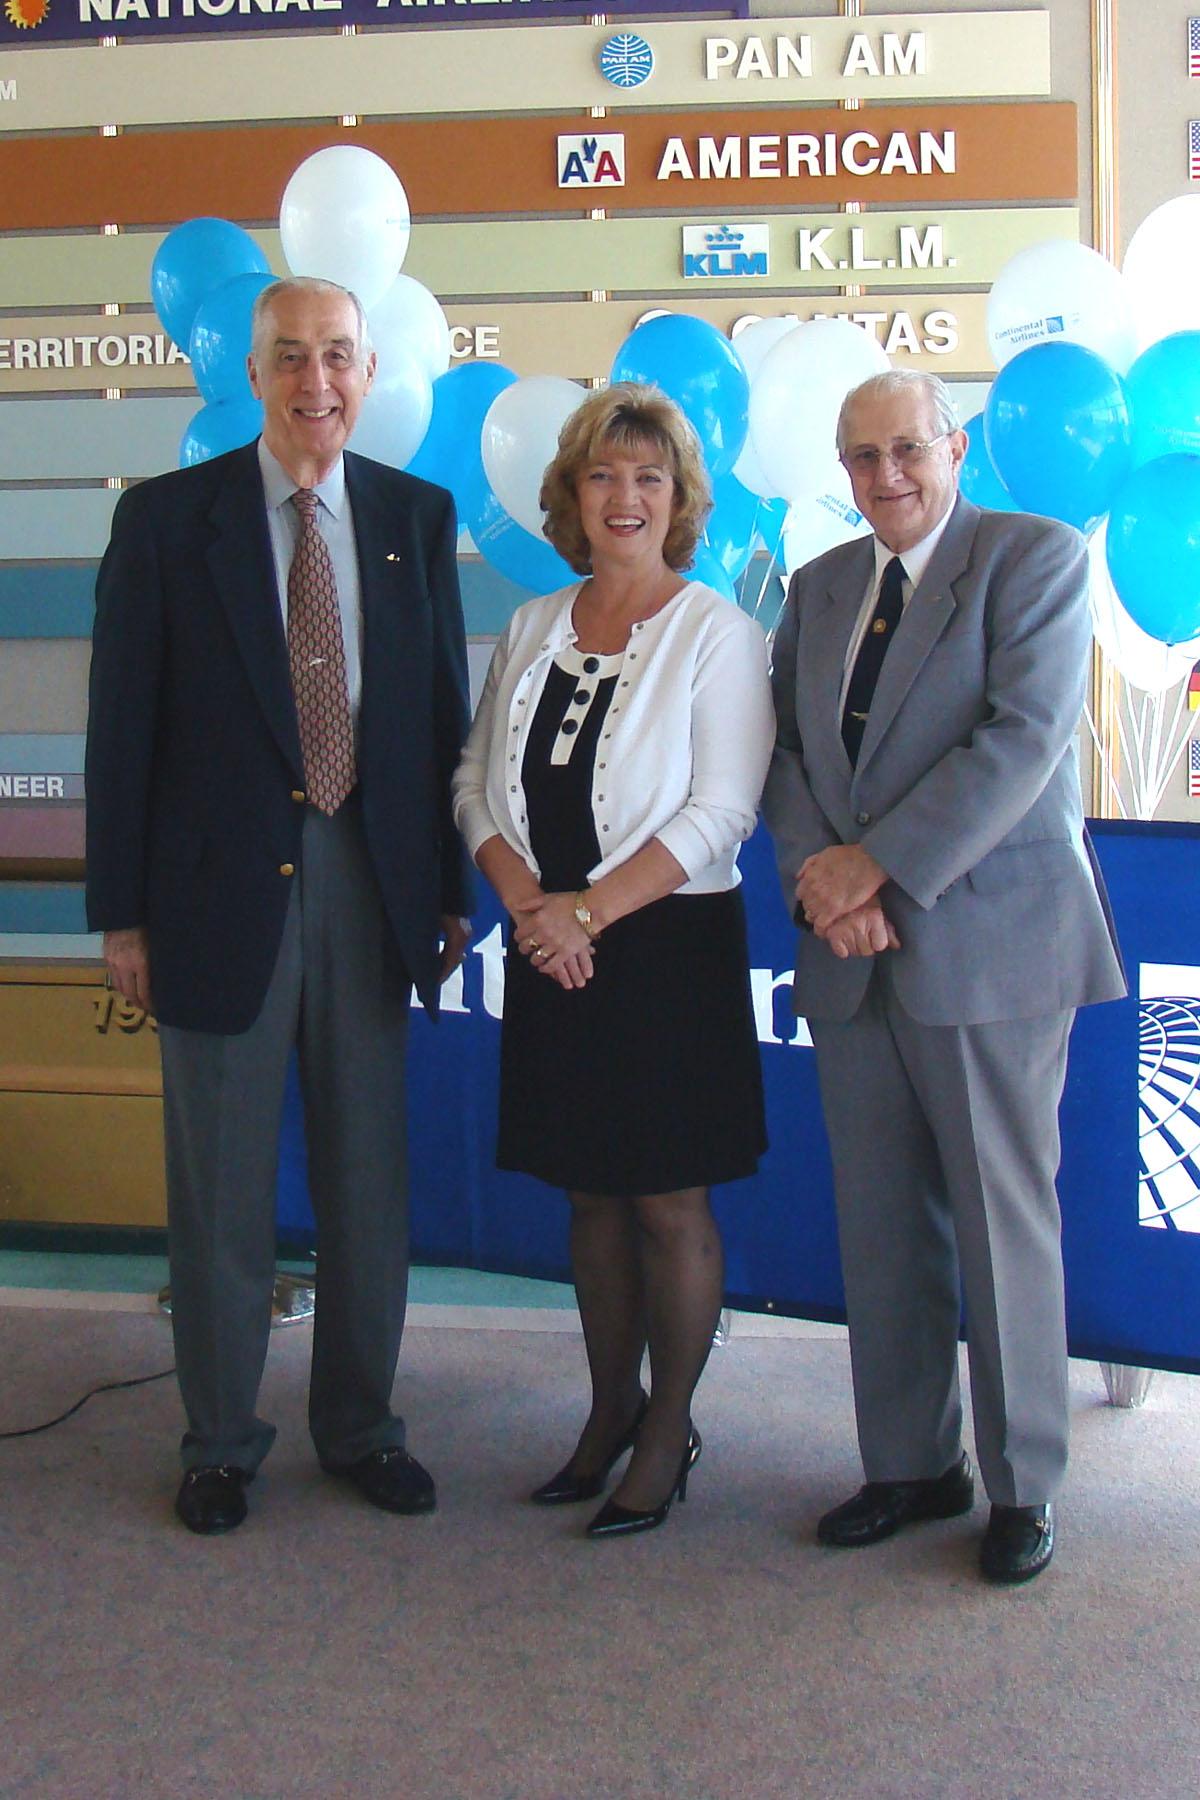 Dick Newton, Colleen Picard & Col. Joe Bullers @ SPMOH - 1, 27 Mar '08.jpg